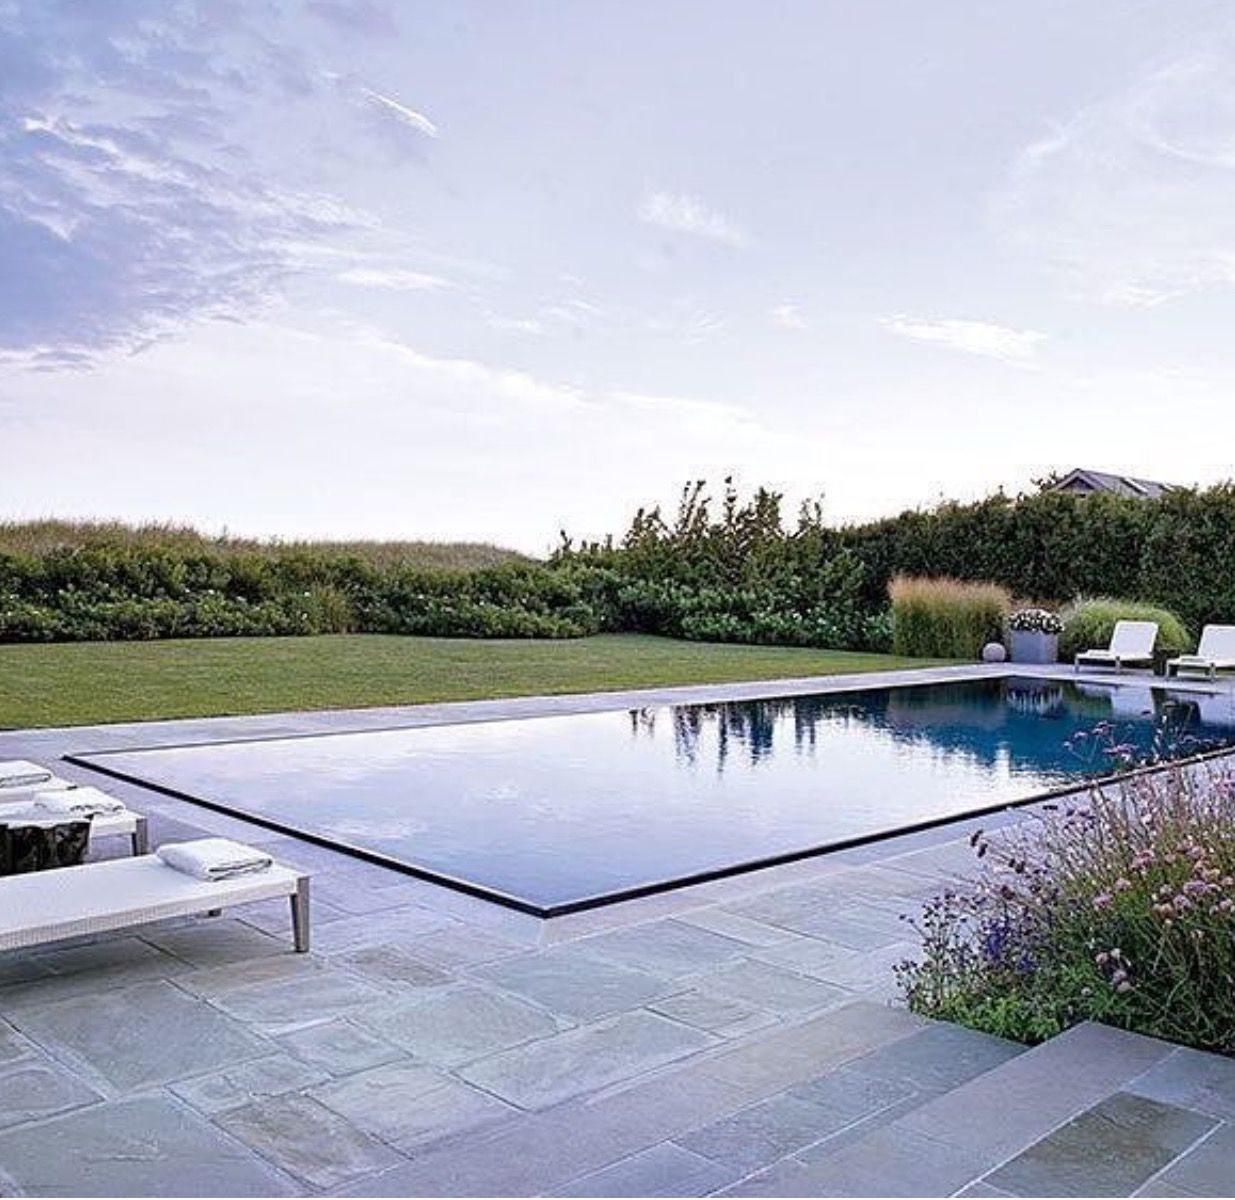 pin by botanik on elements pool modern pools infinity edge pool swimming pool designs. Black Bedroom Furniture Sets. Home Design Ideas